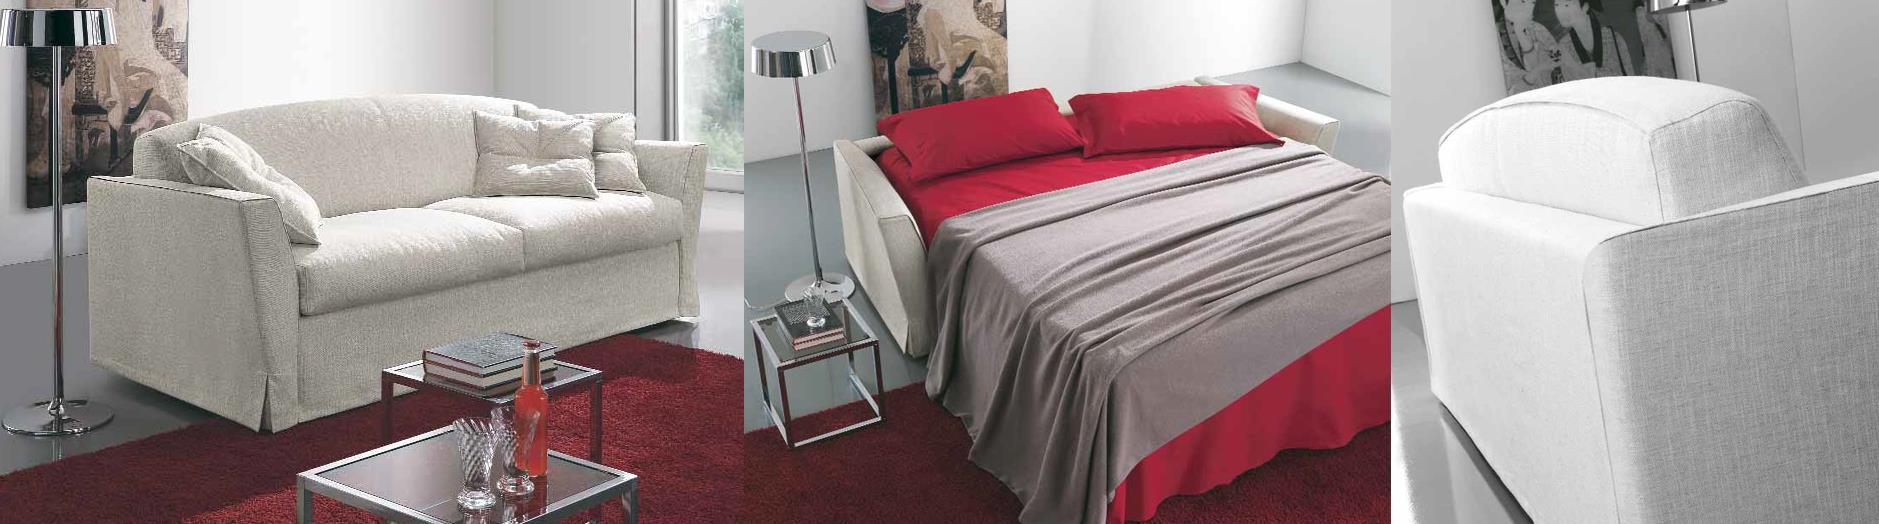 Venezia-Sofa-Bed